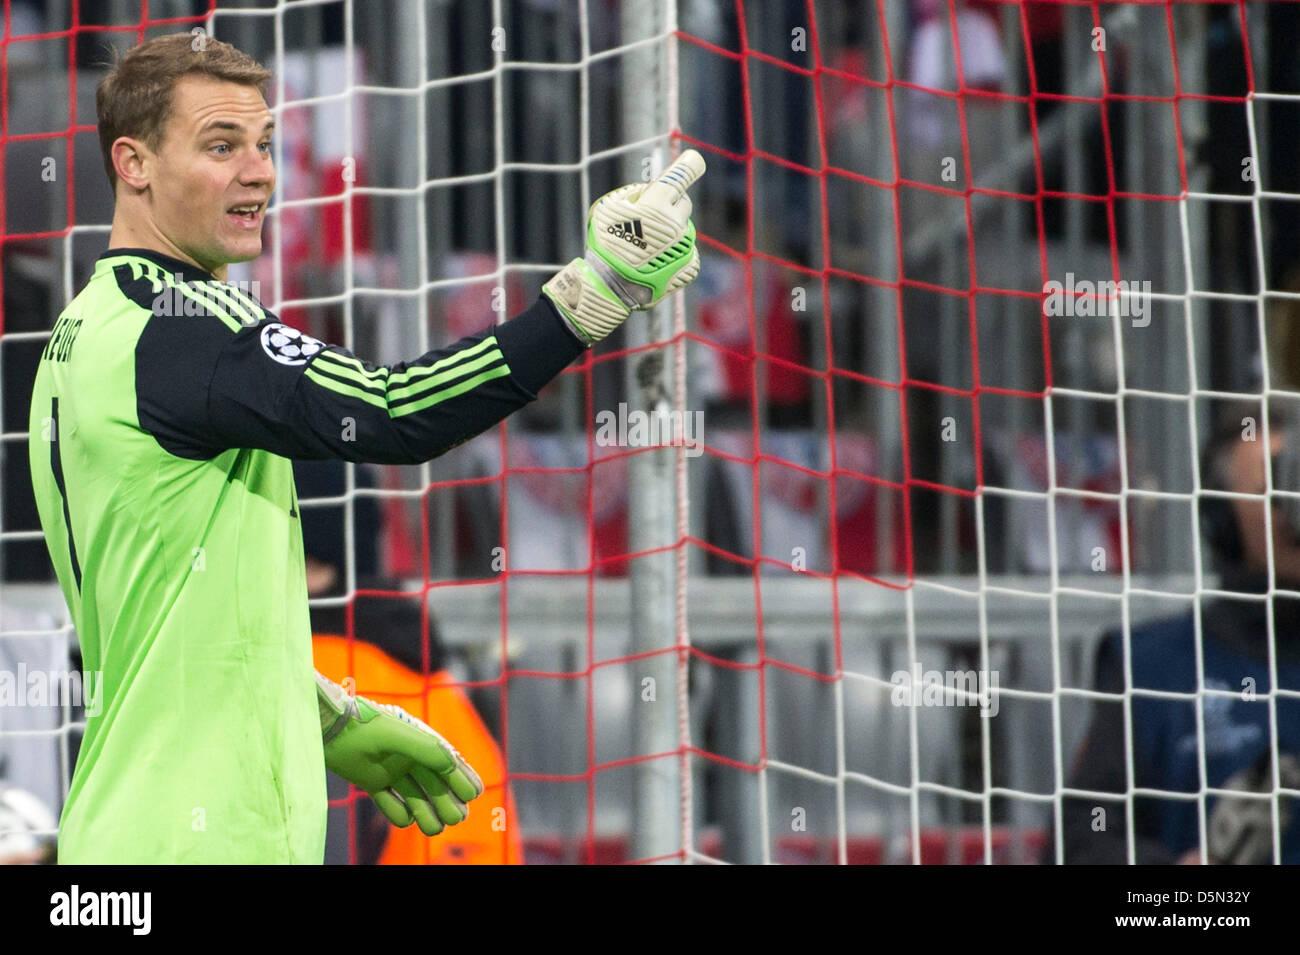 Manuel Neuer (Bayern), 2 de abril de 2013 - Fútbol / Fútbol UEFA ...